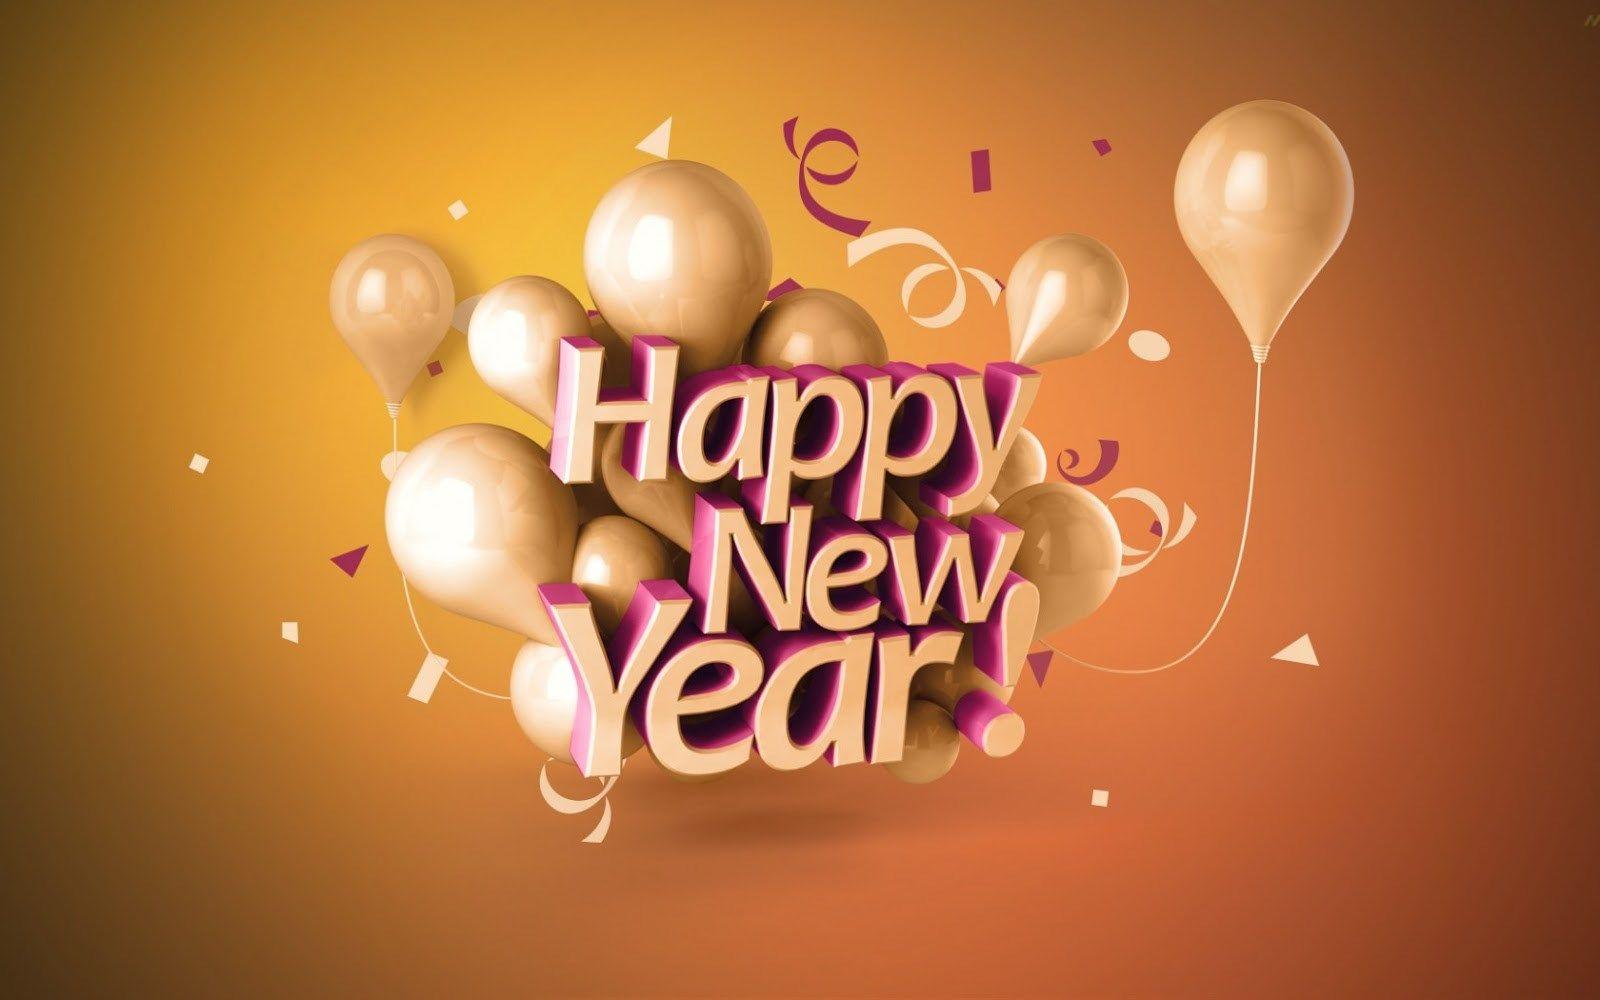 Free Desktop Happy New Year Hd Wallpapers Images Ololoshka